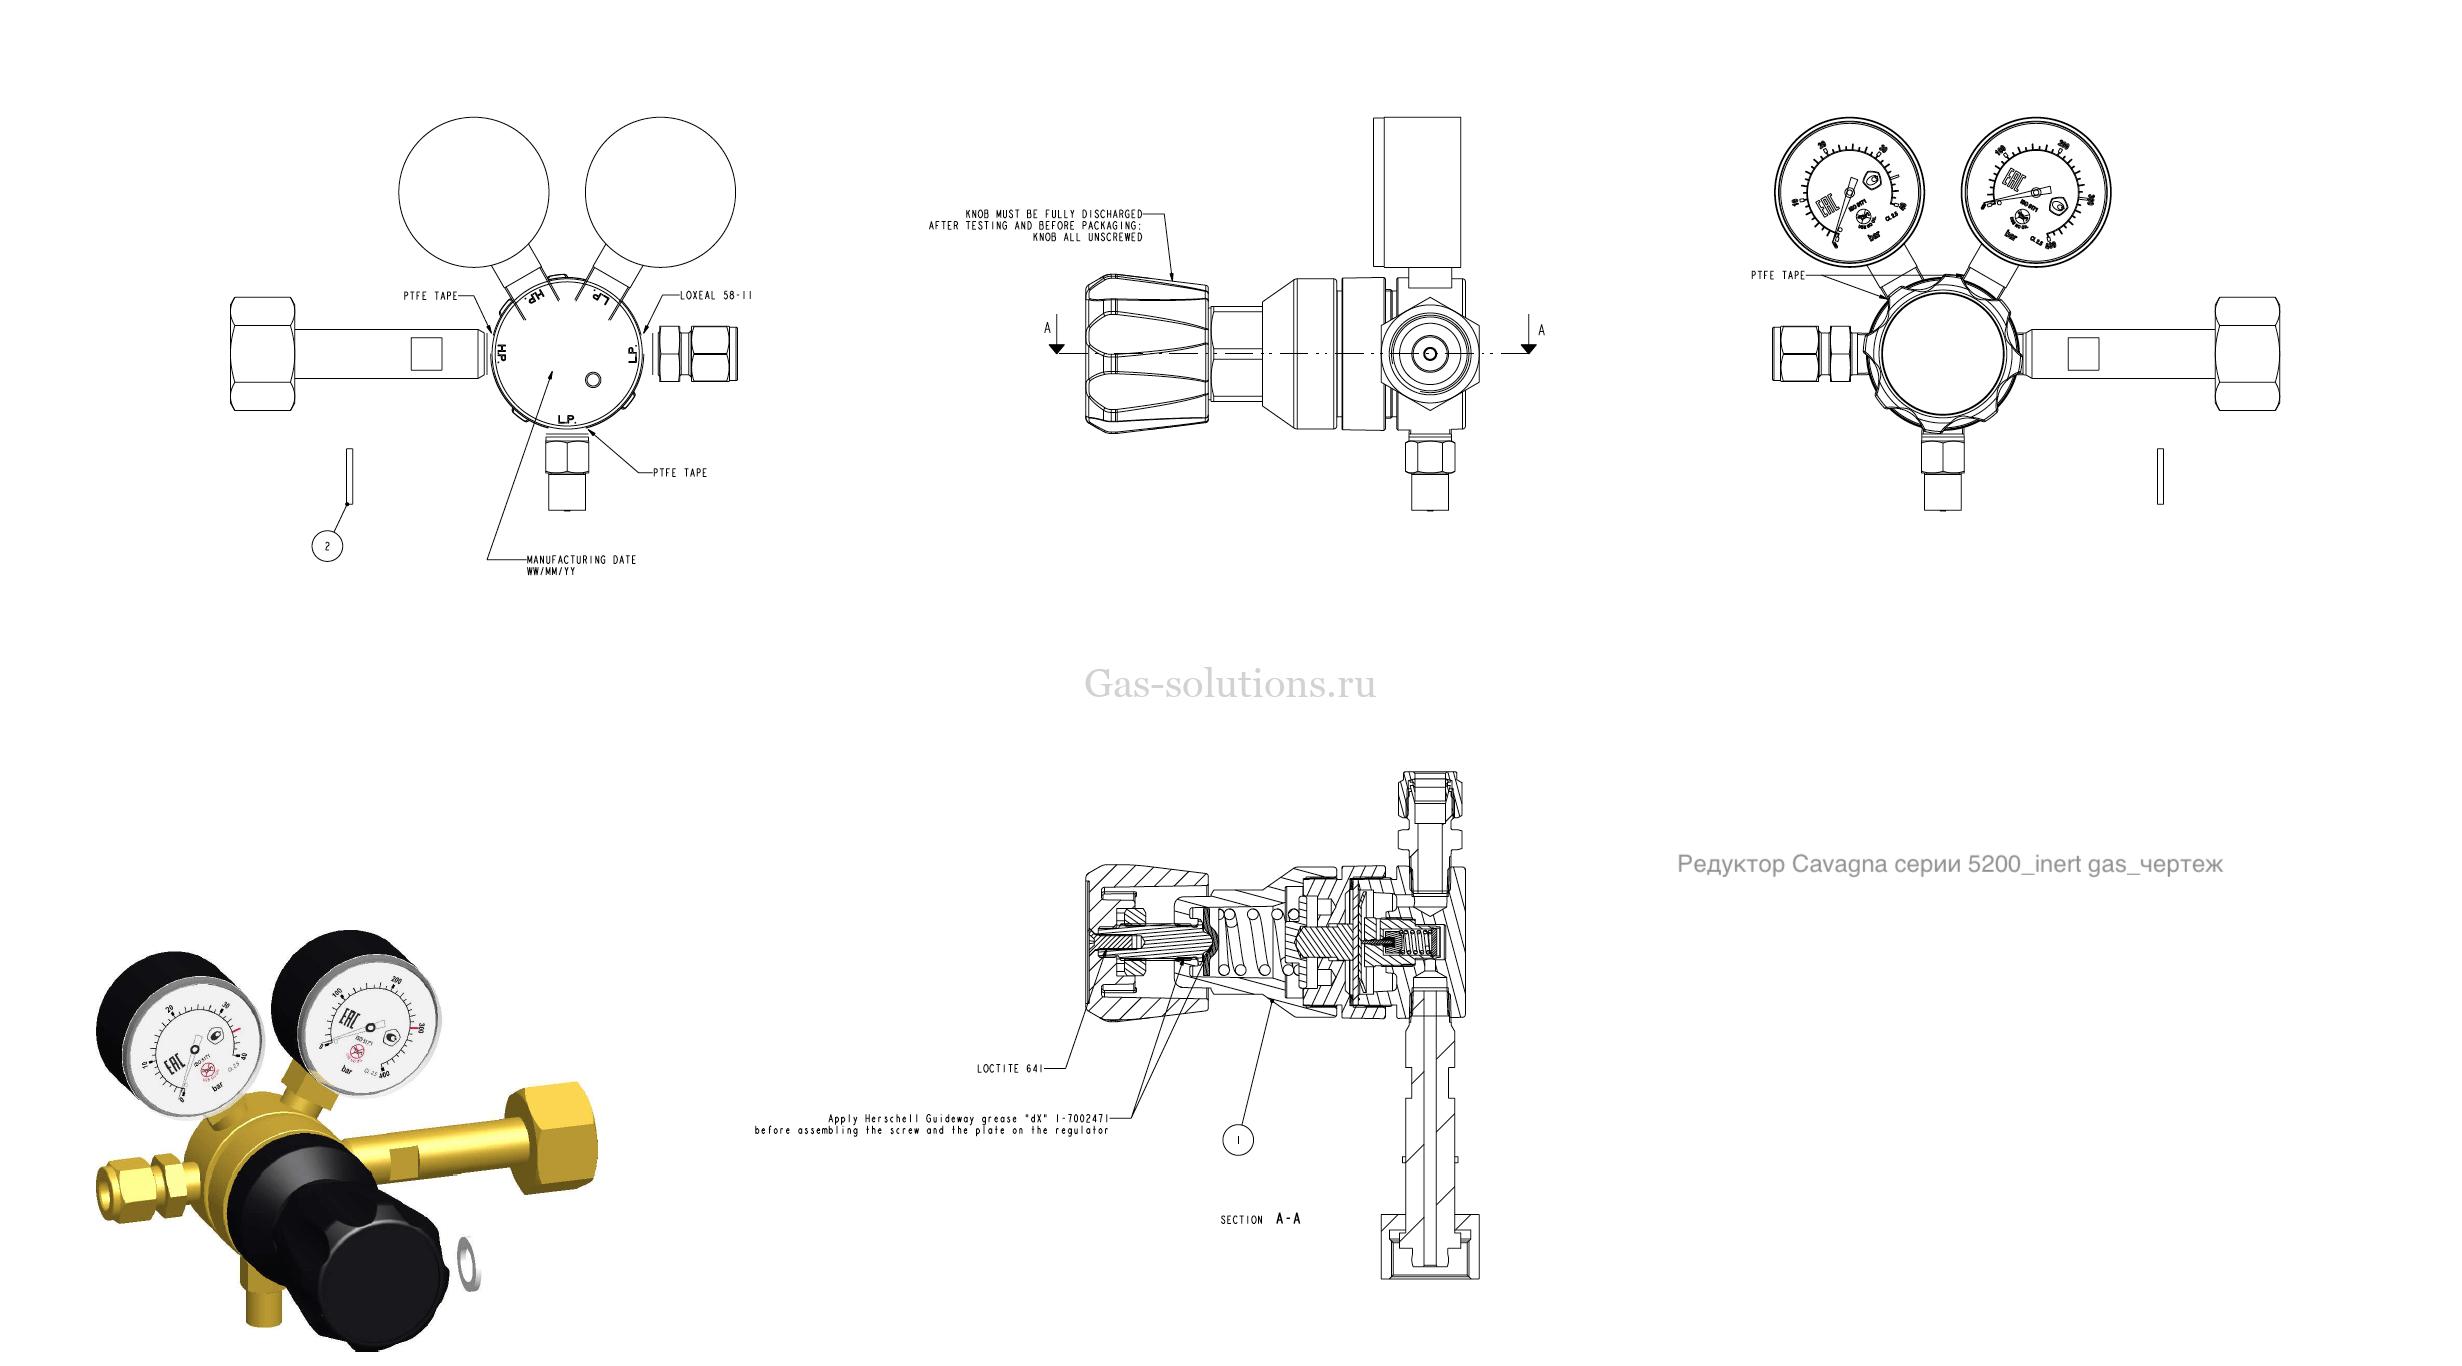 Редуктор Cavagna серии 5200_inert gas_чертеж 1